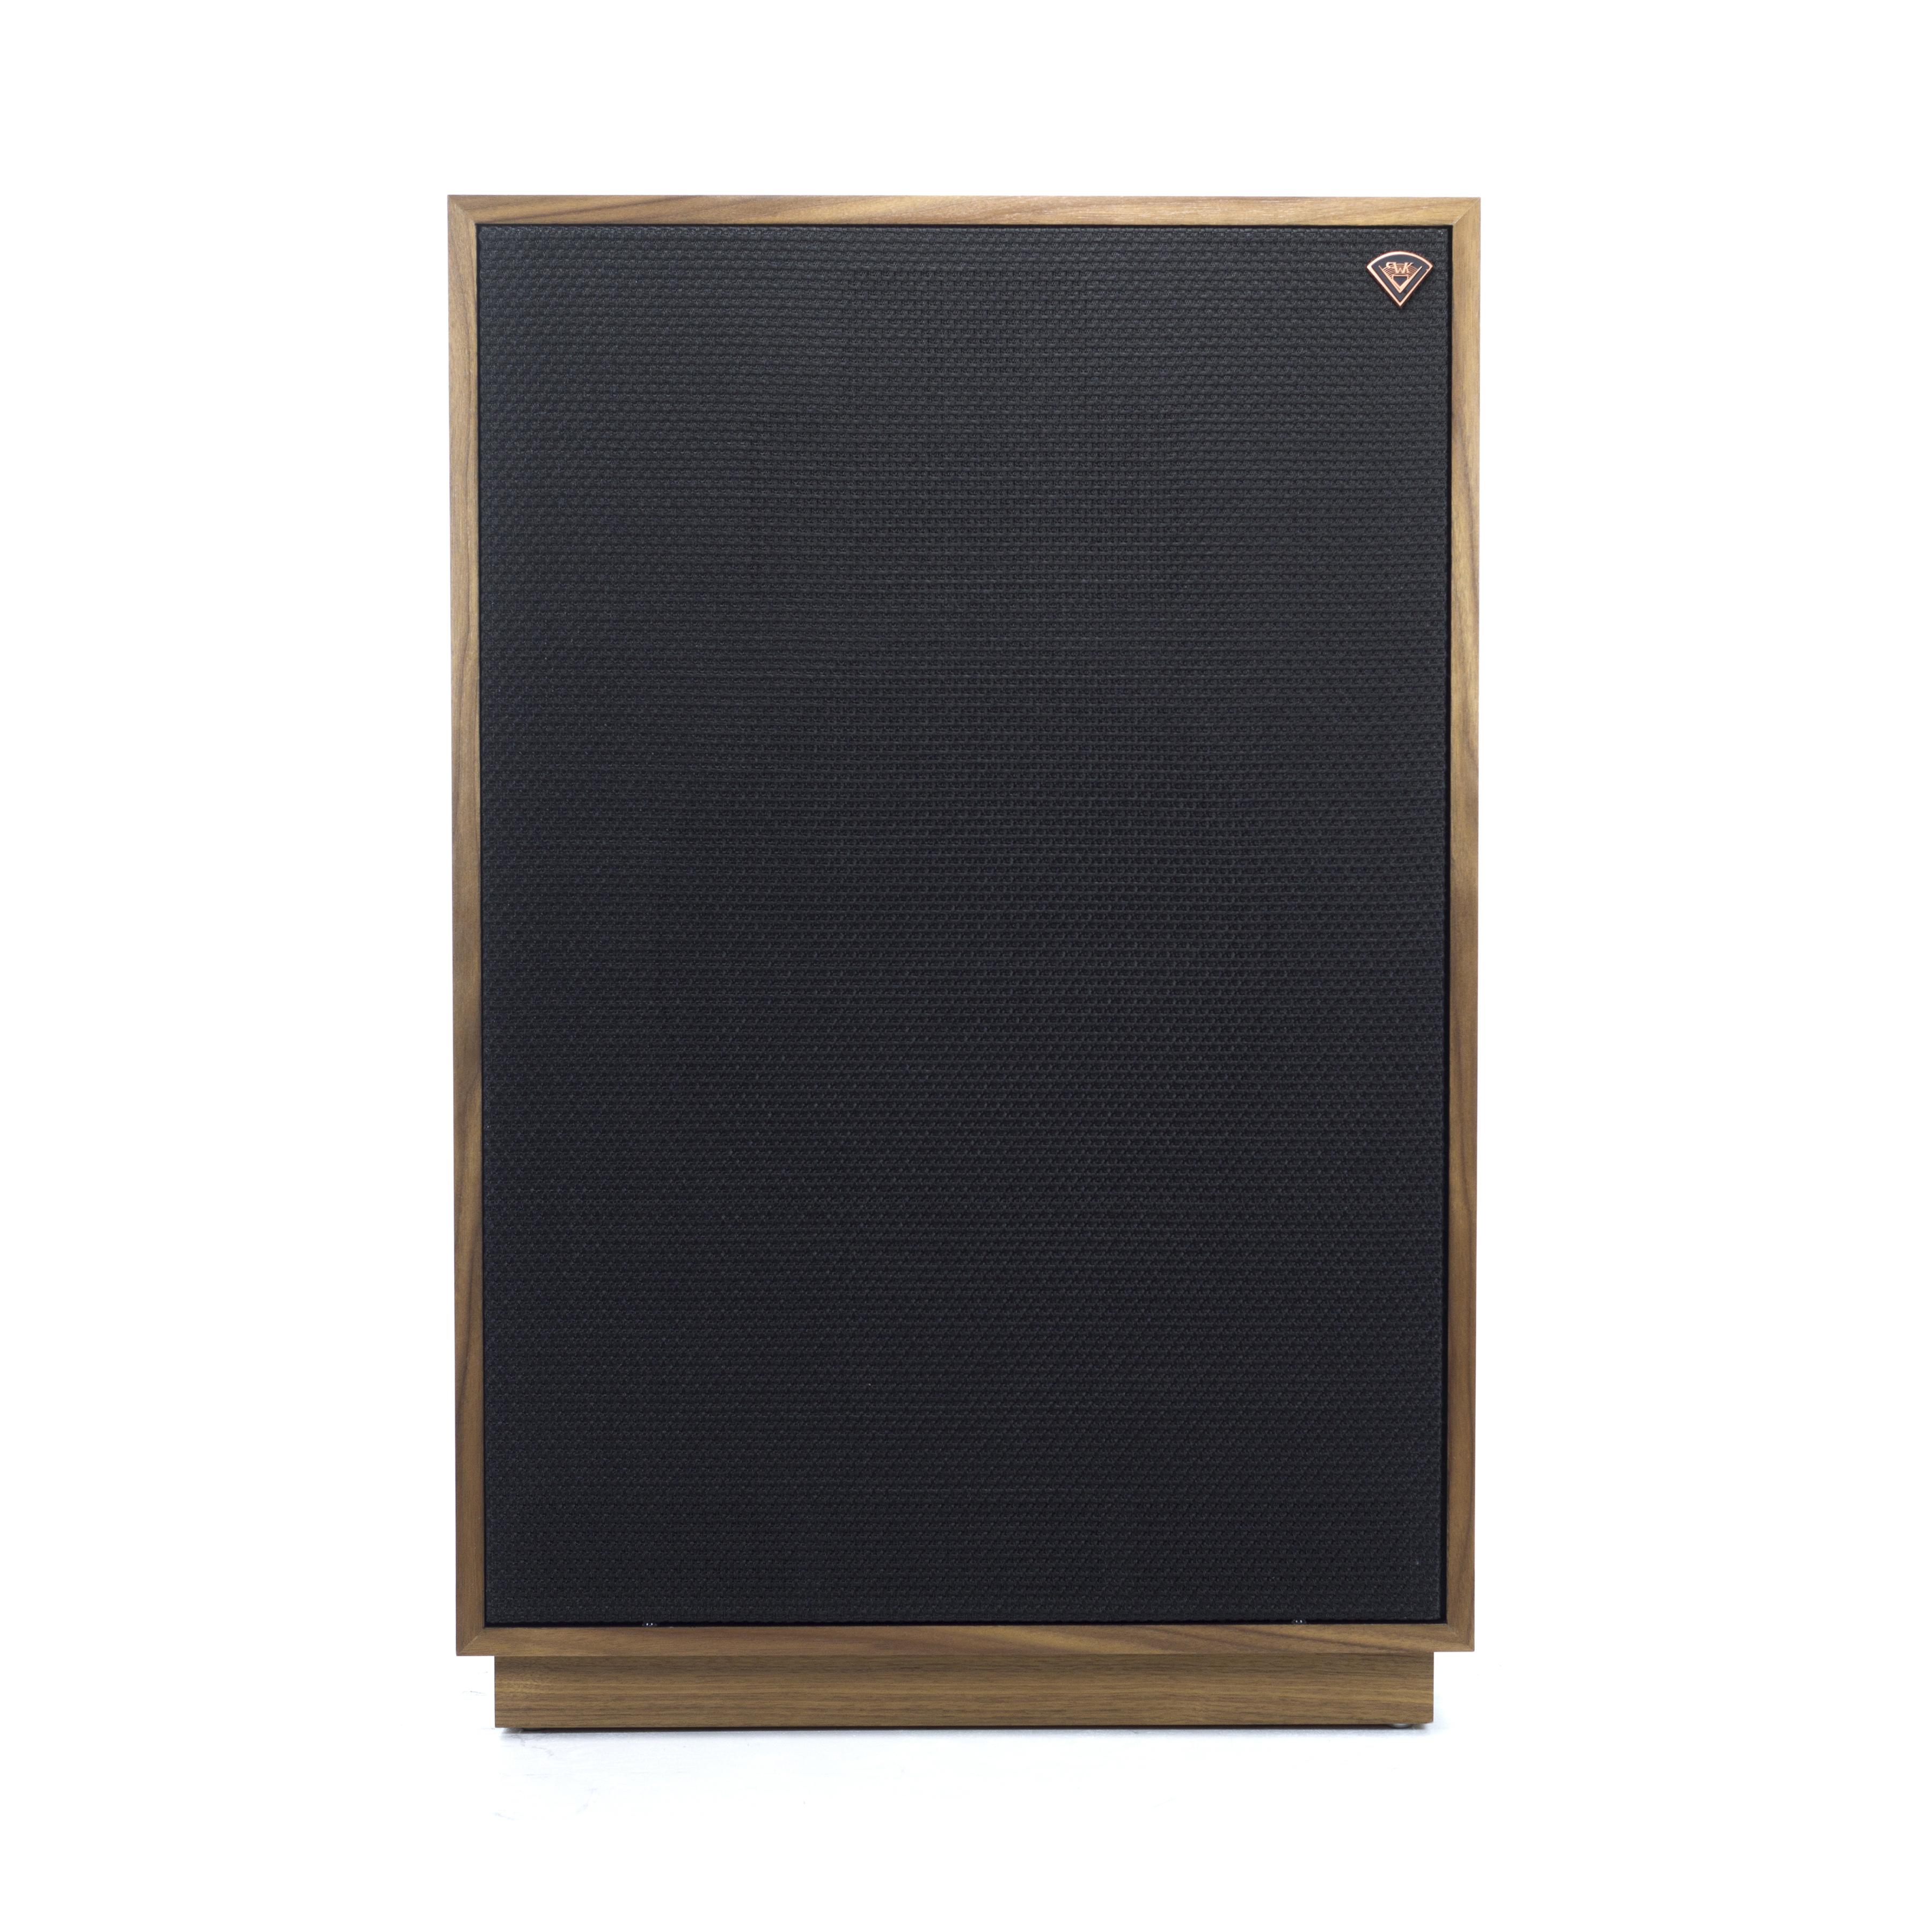 Cornwall III Floorstanding Speaker